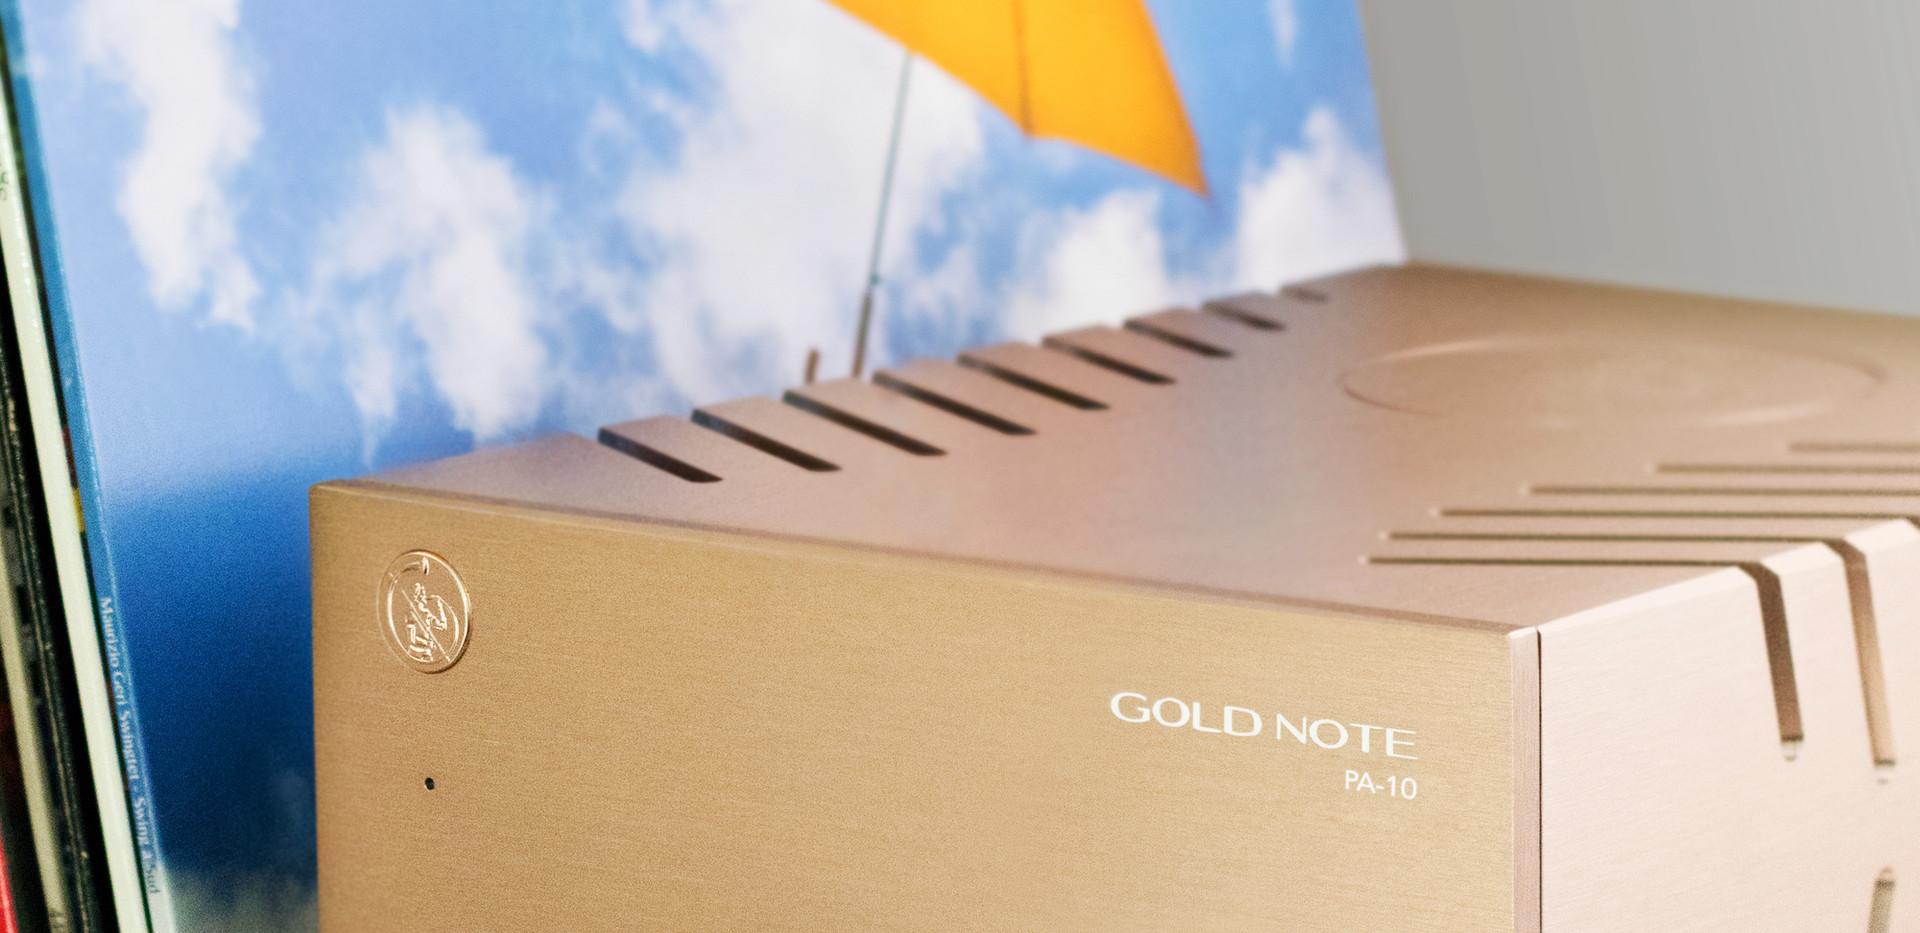 Gold Note PA-10 с виниловой пластинкой